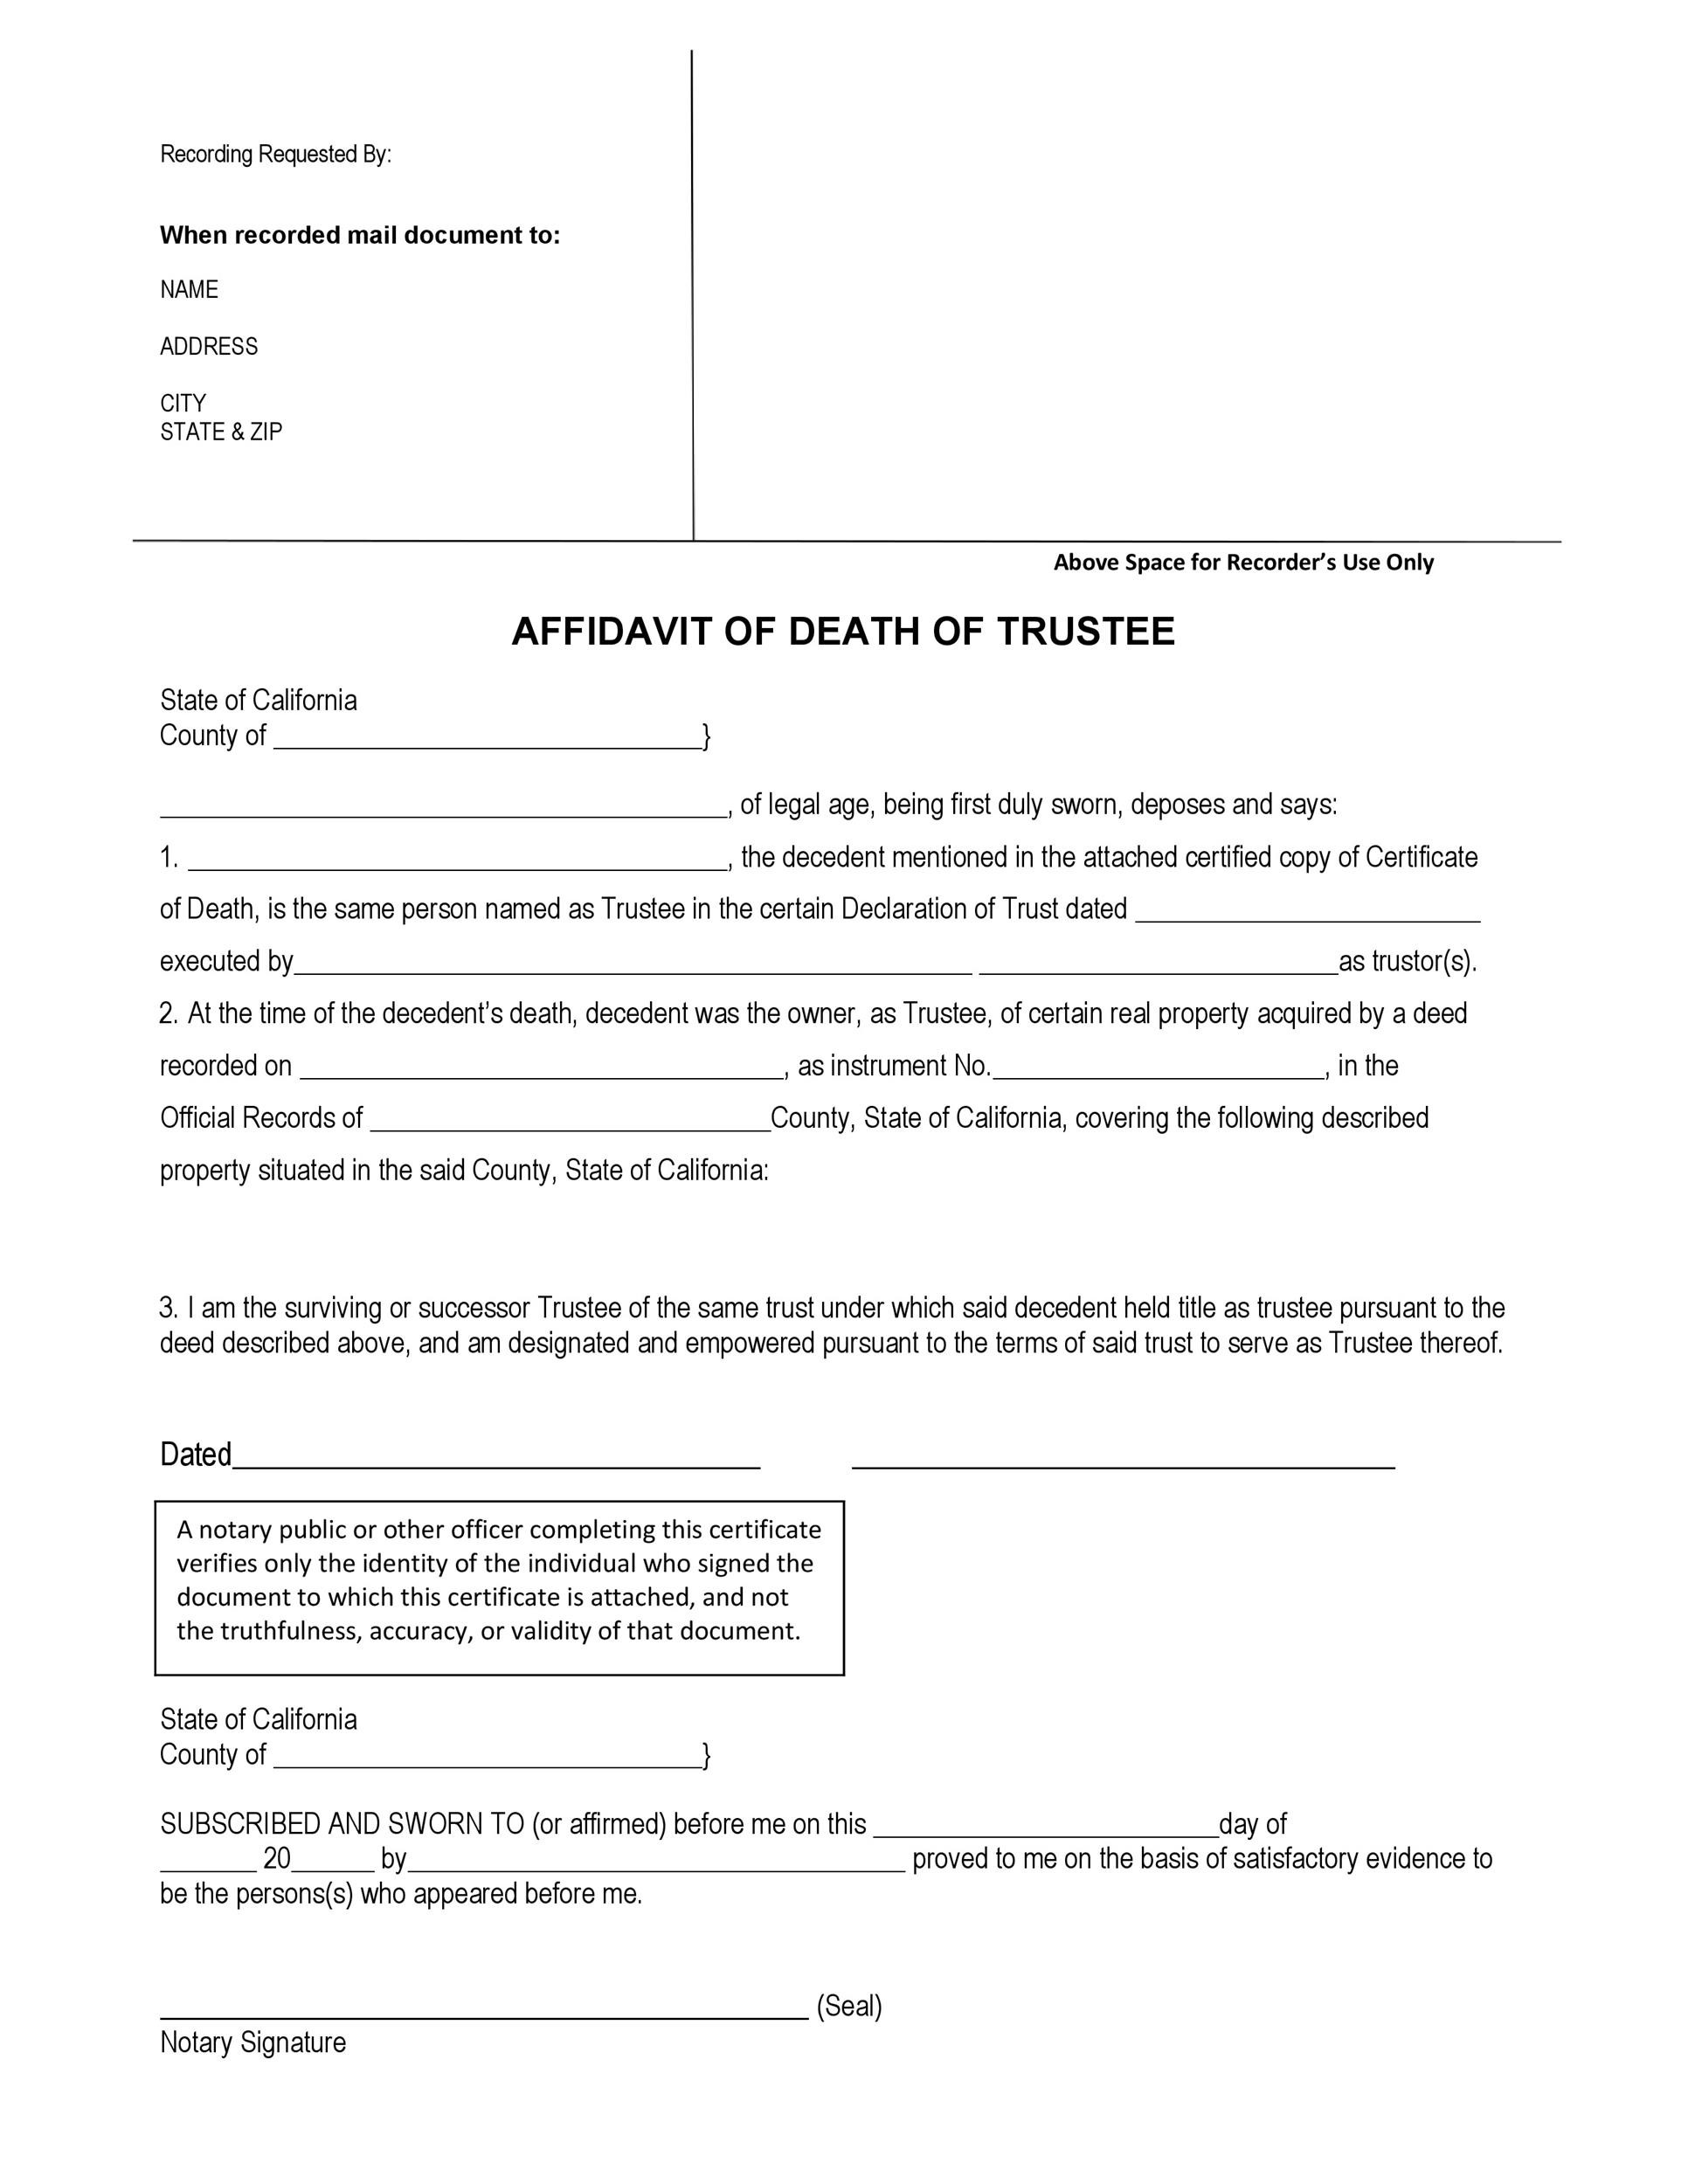 Free affidavit of death 03